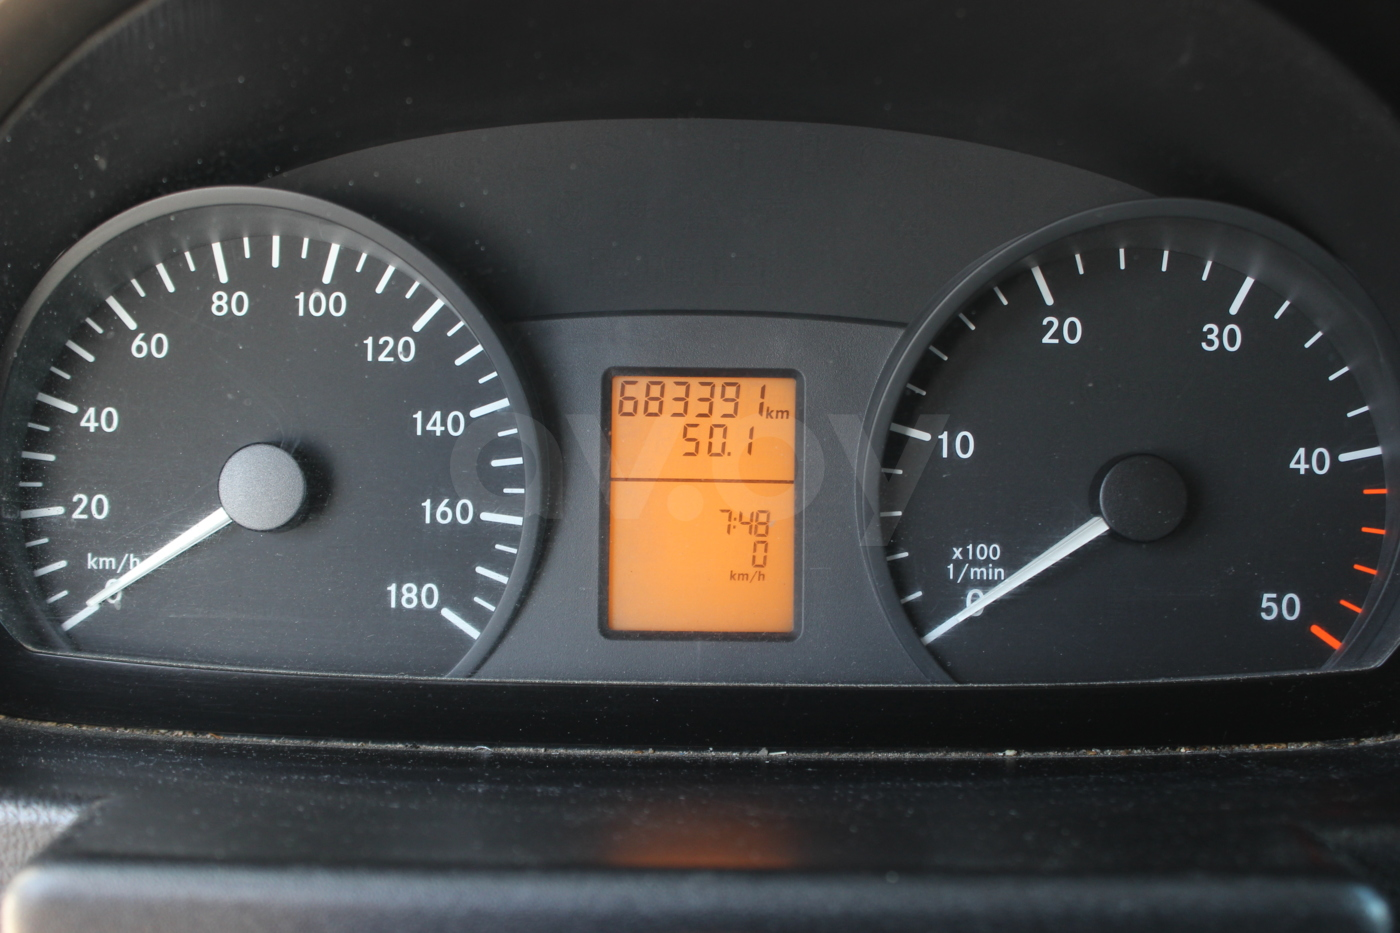 Mercedes-Benz Sprinter, 2006 г.